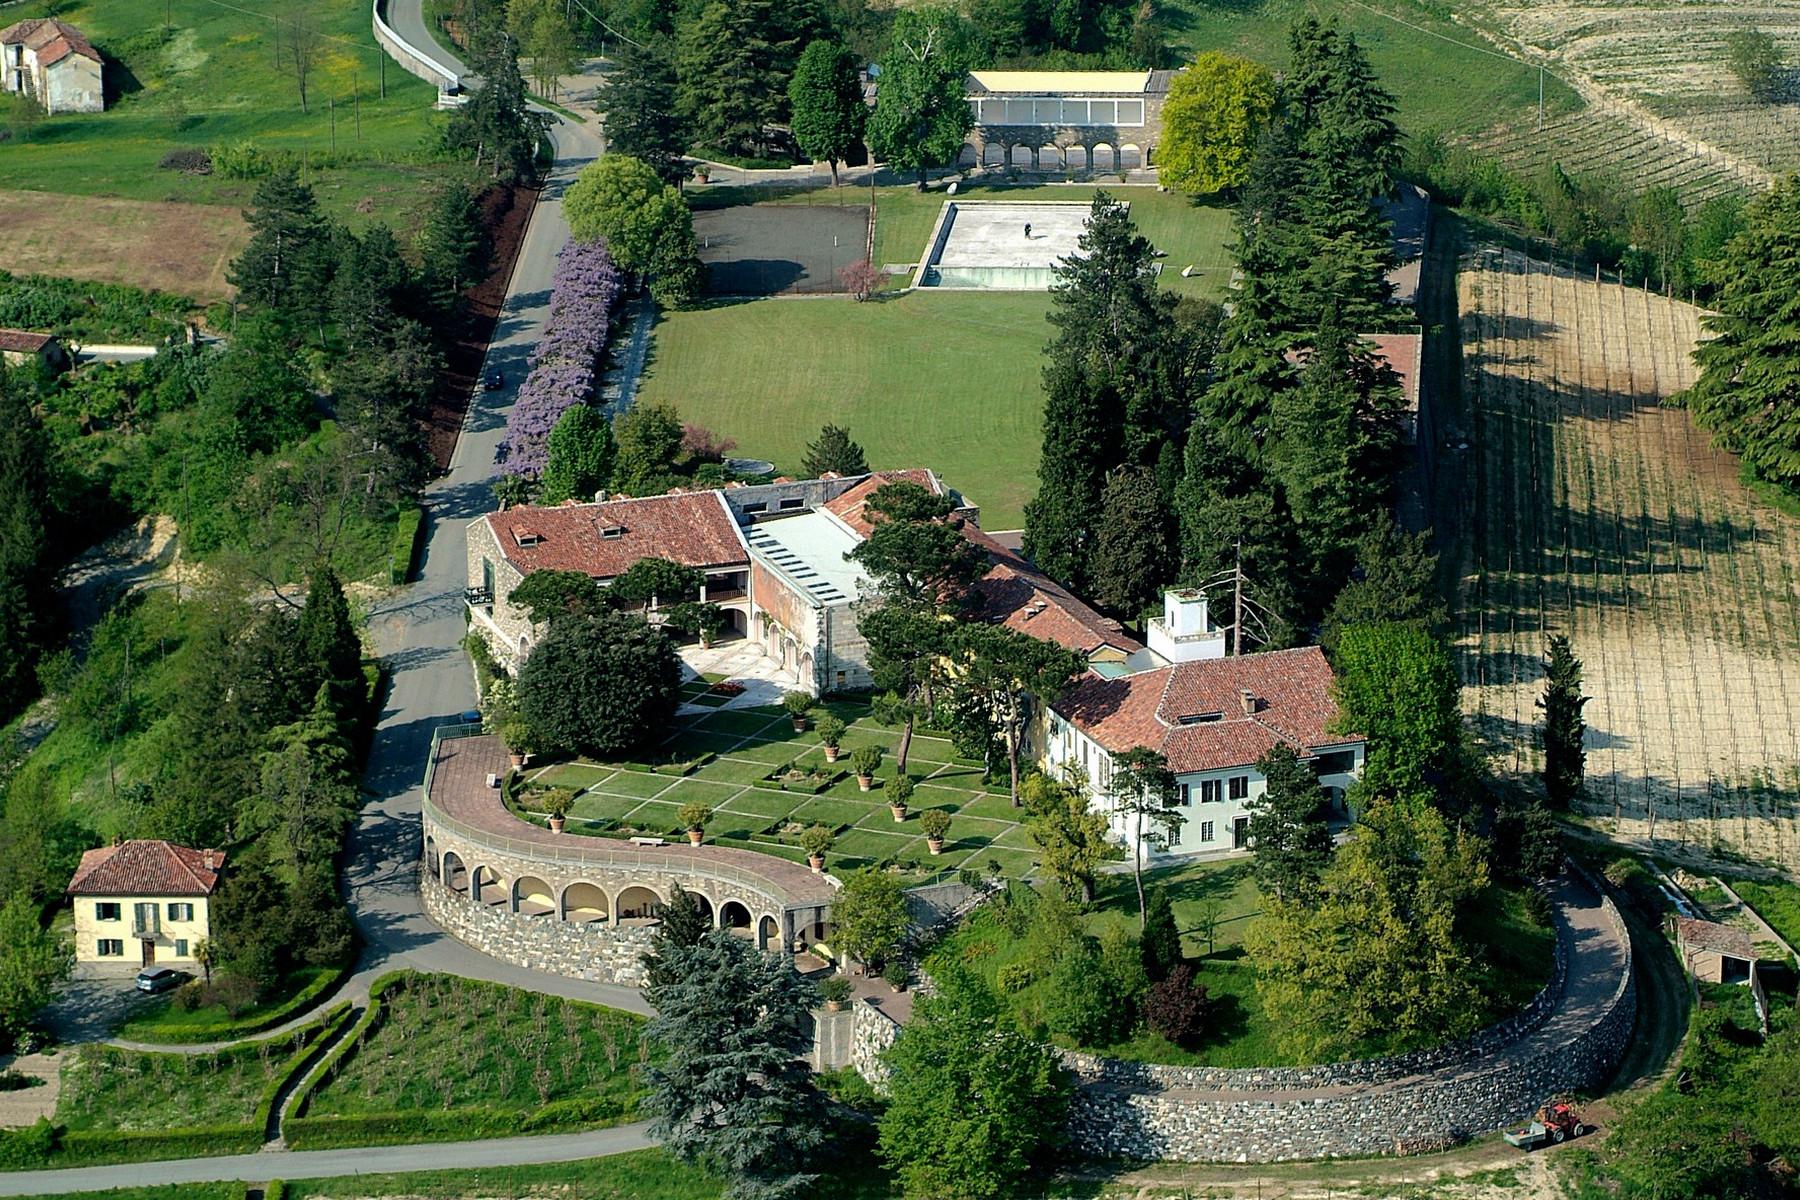 独户住宅 为 销售 在 Villa Ottolenghi, architectural masterpiece in Monferrato Strada Monterosso 阿奎泰尔梅, 亚历山德里亚, 15011 意大利